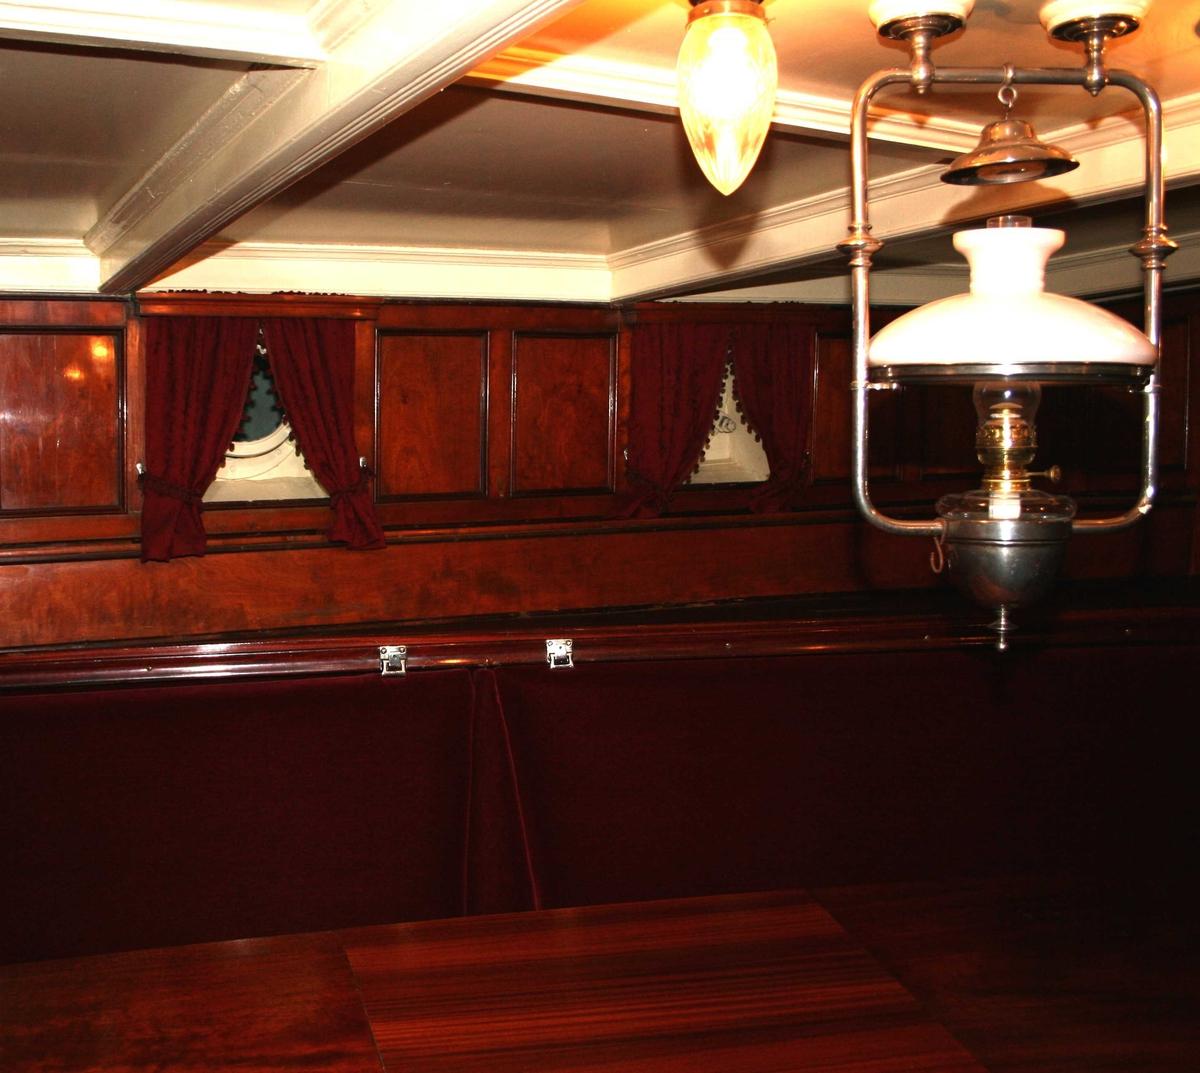 Salong, 1. klasse, fra skipets akterende,  med mahognypanel, mahognybord, sofaer trukket med rød plysj,  rød mønstret teppe på gulvet.  Med bufé, speil og skipsklokke .